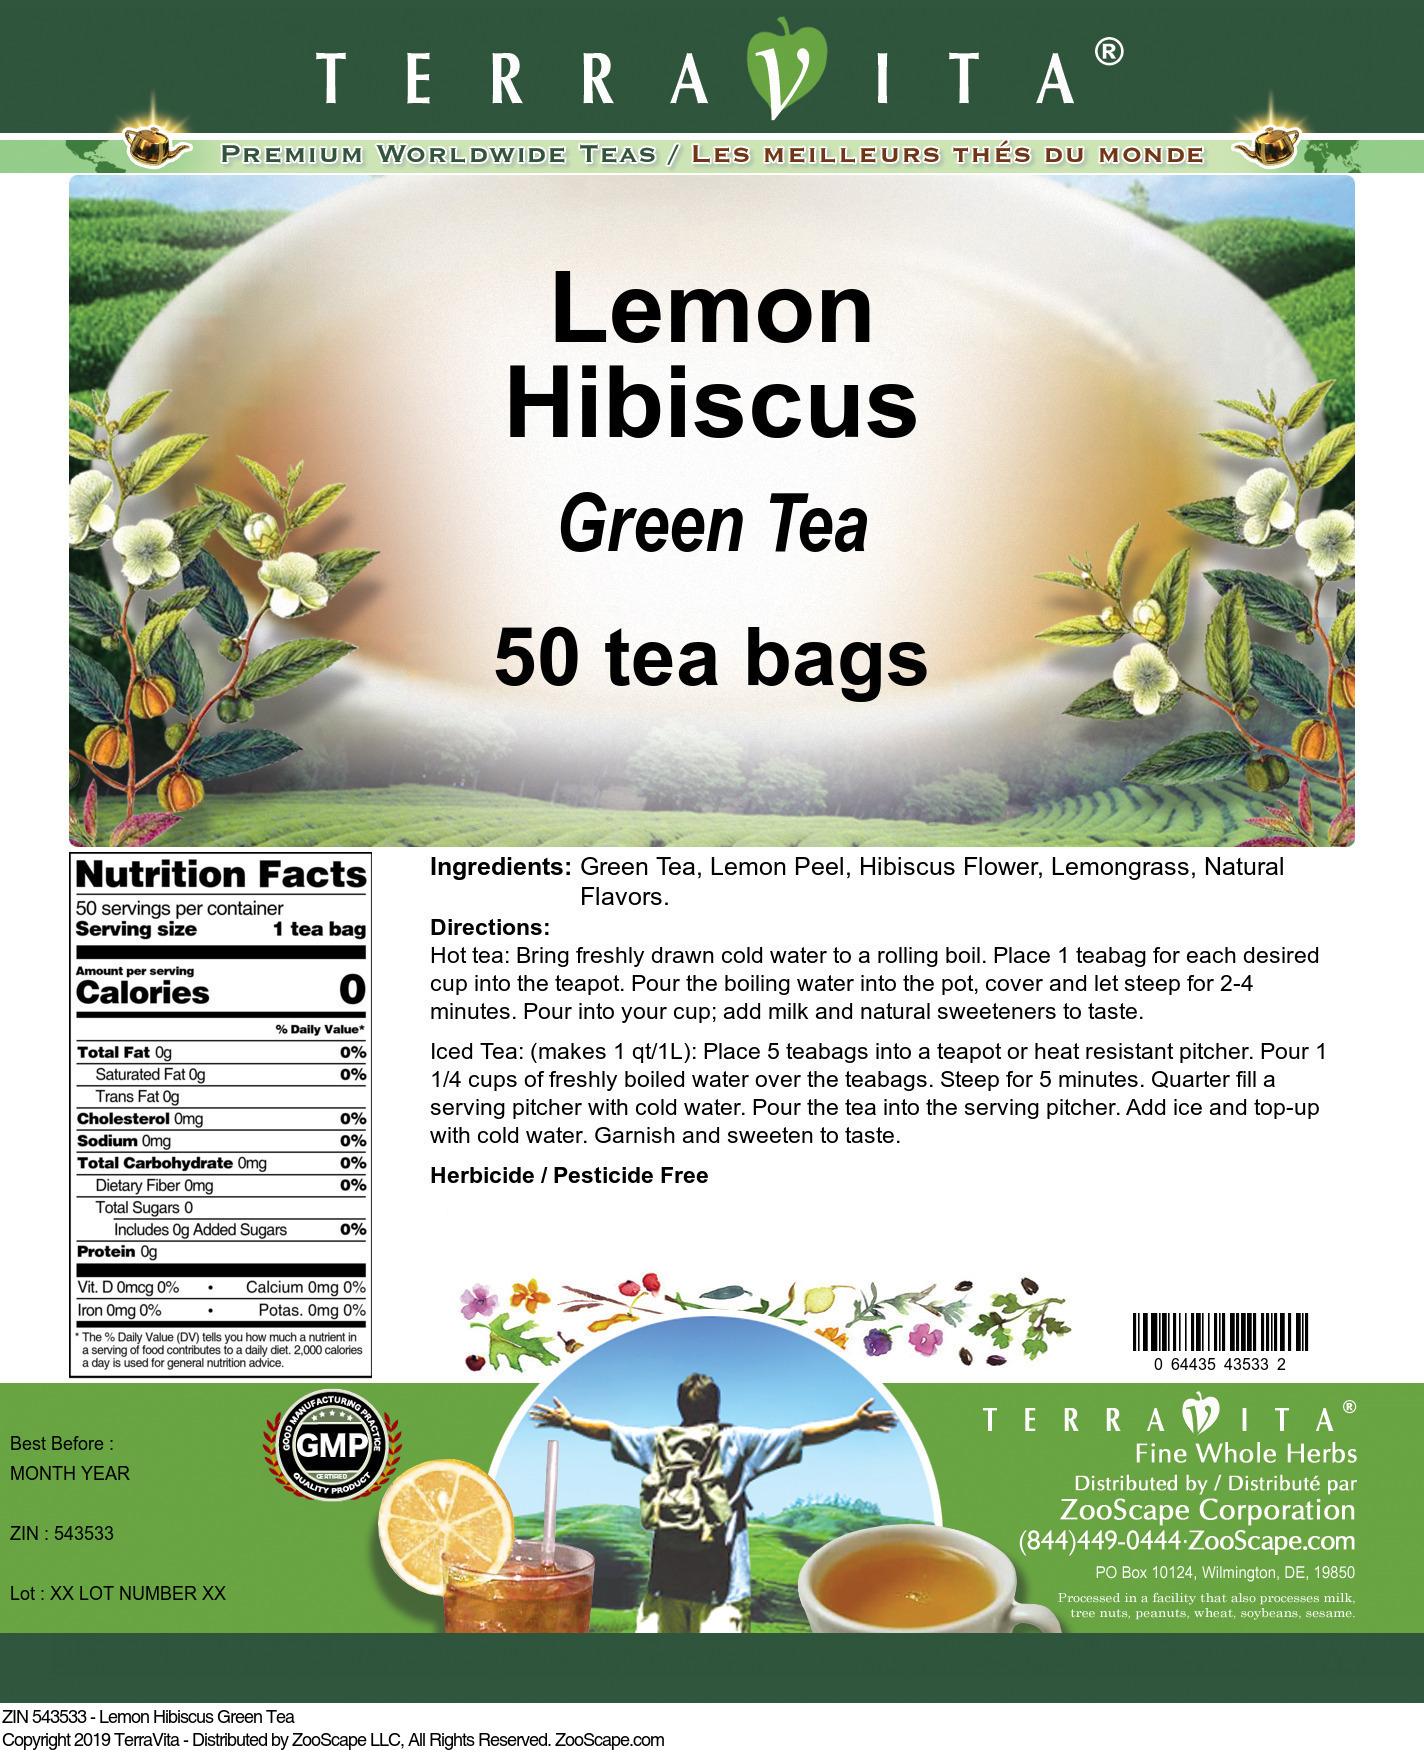 Lemon Hibiscus Green Tea